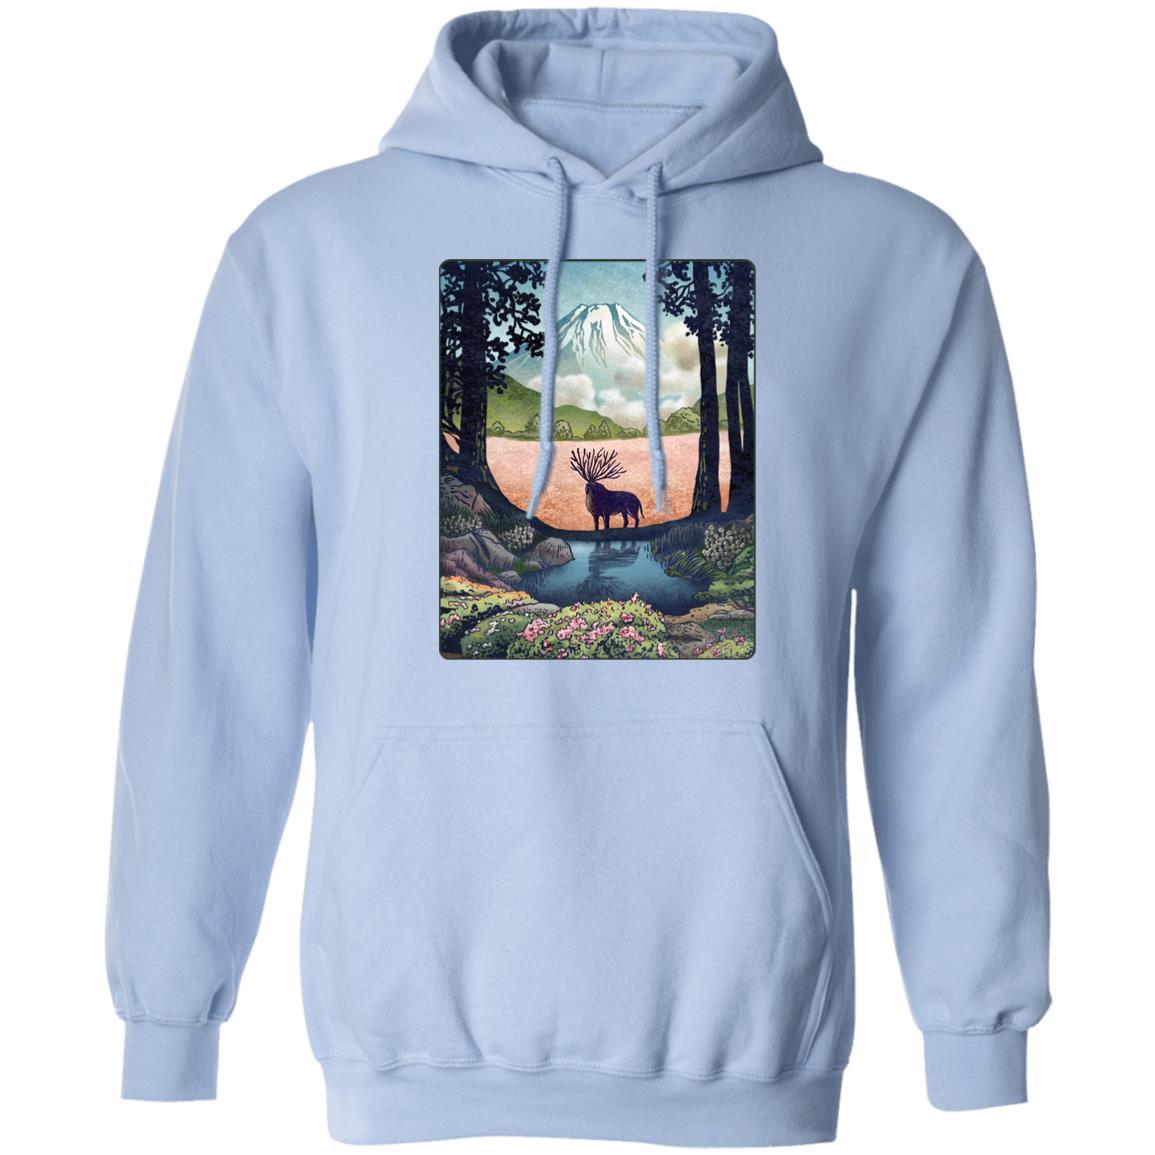 Princess Mononoke – Shishigami Day Time Landscape Hoodie